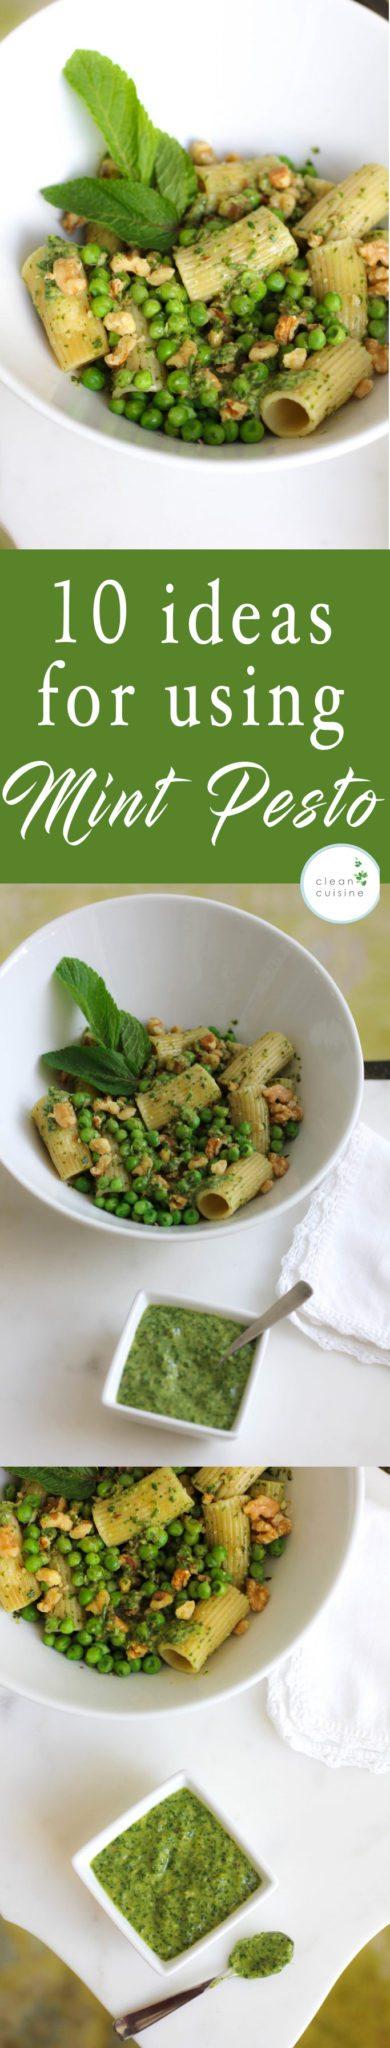 10 ideas for using Mint Pesto